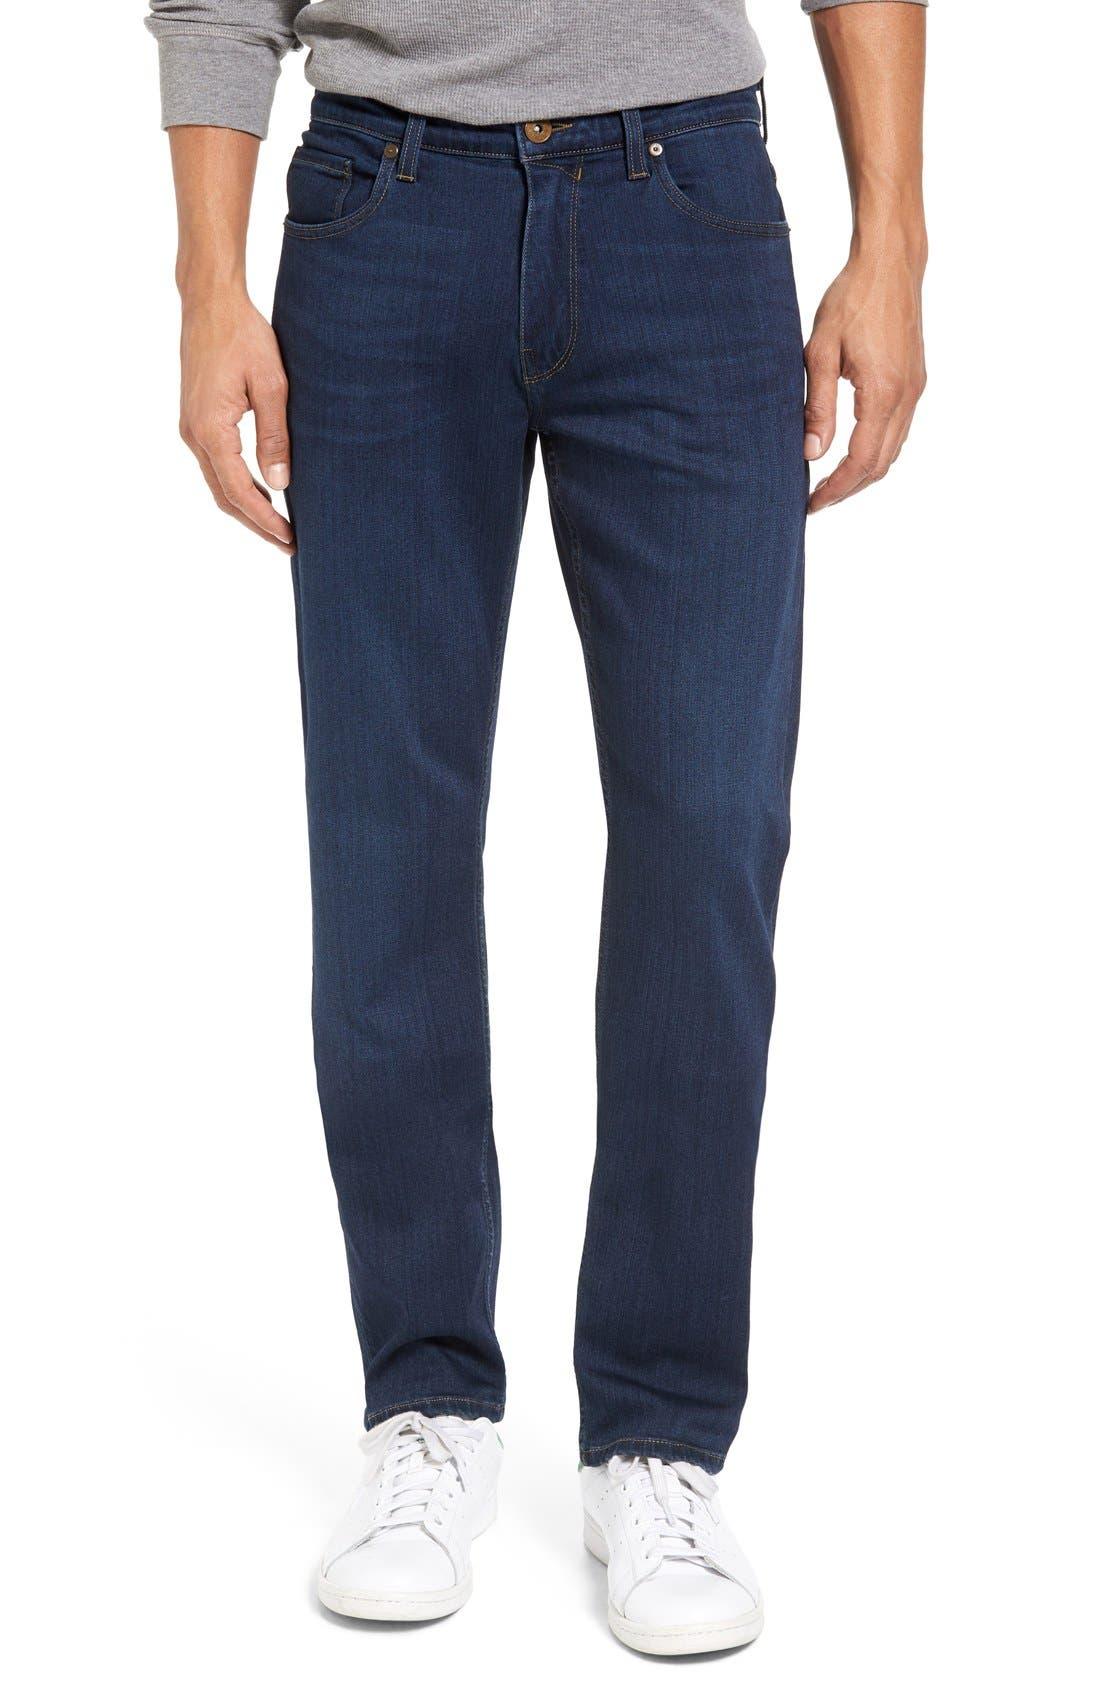 Transcend - Federal Slim Straight Leg Jeans,                             Main thumbnail 1, color,                             SCOTT